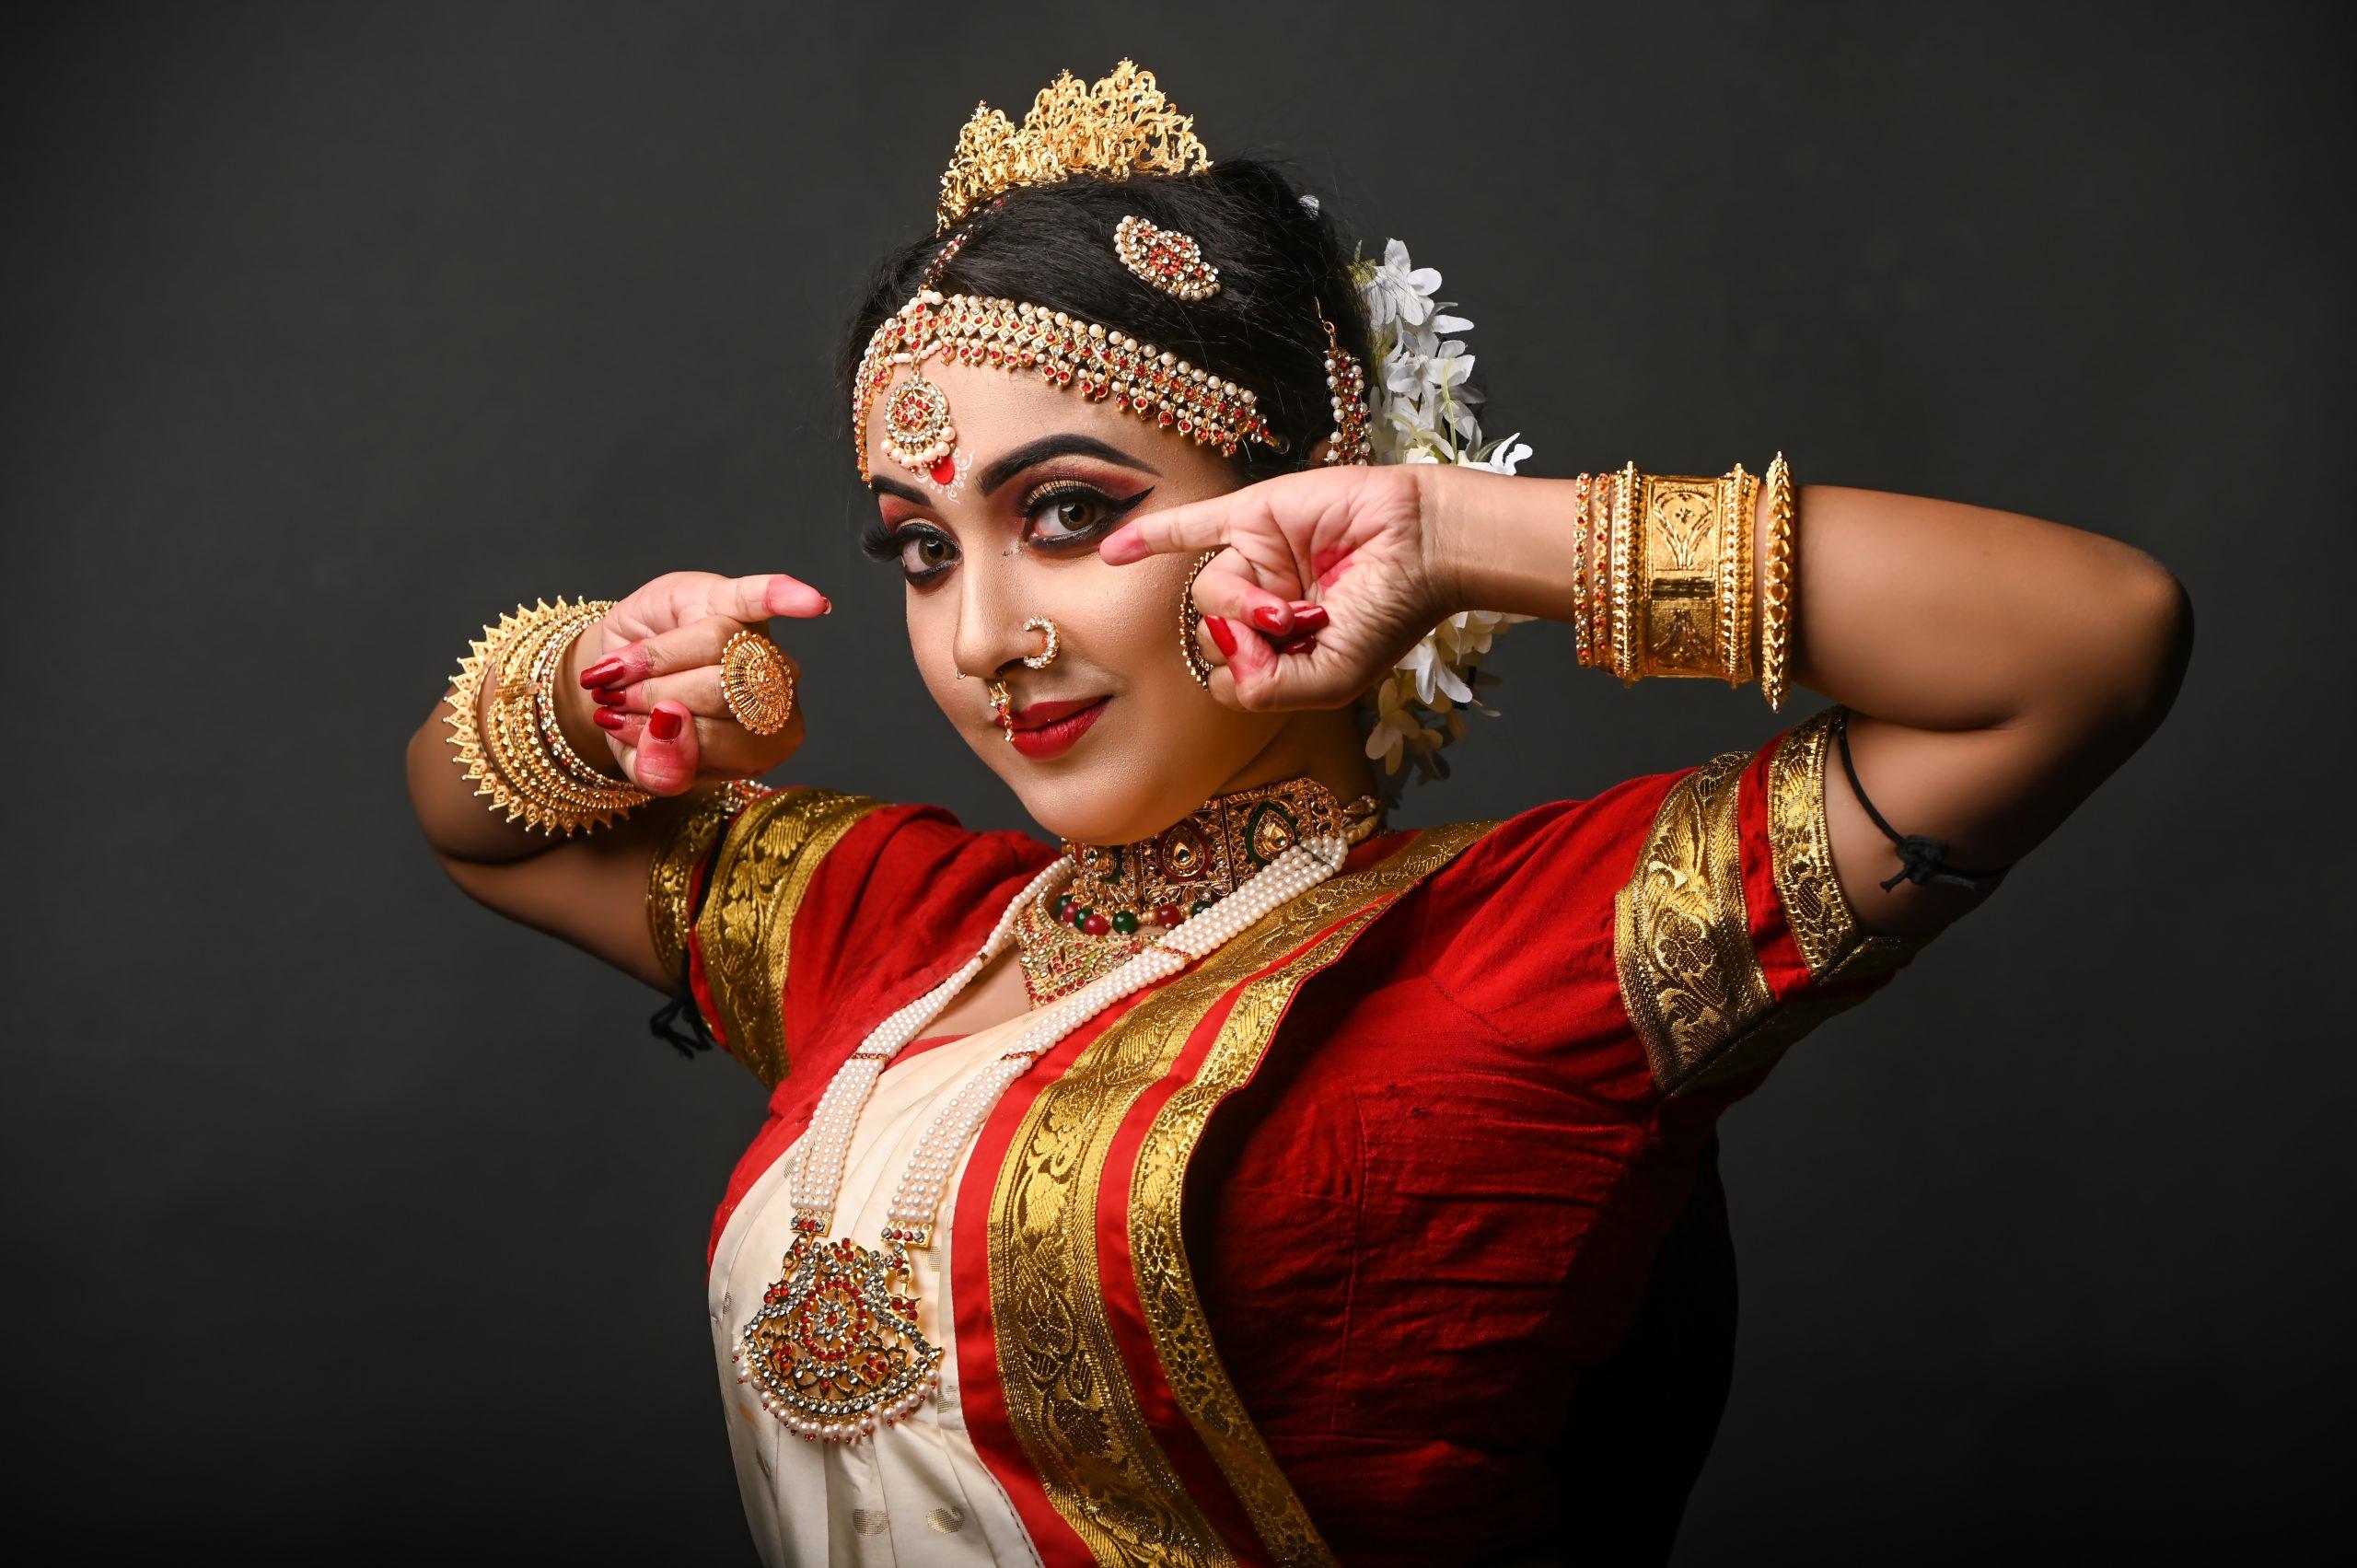 A female Bharat natyam dancer